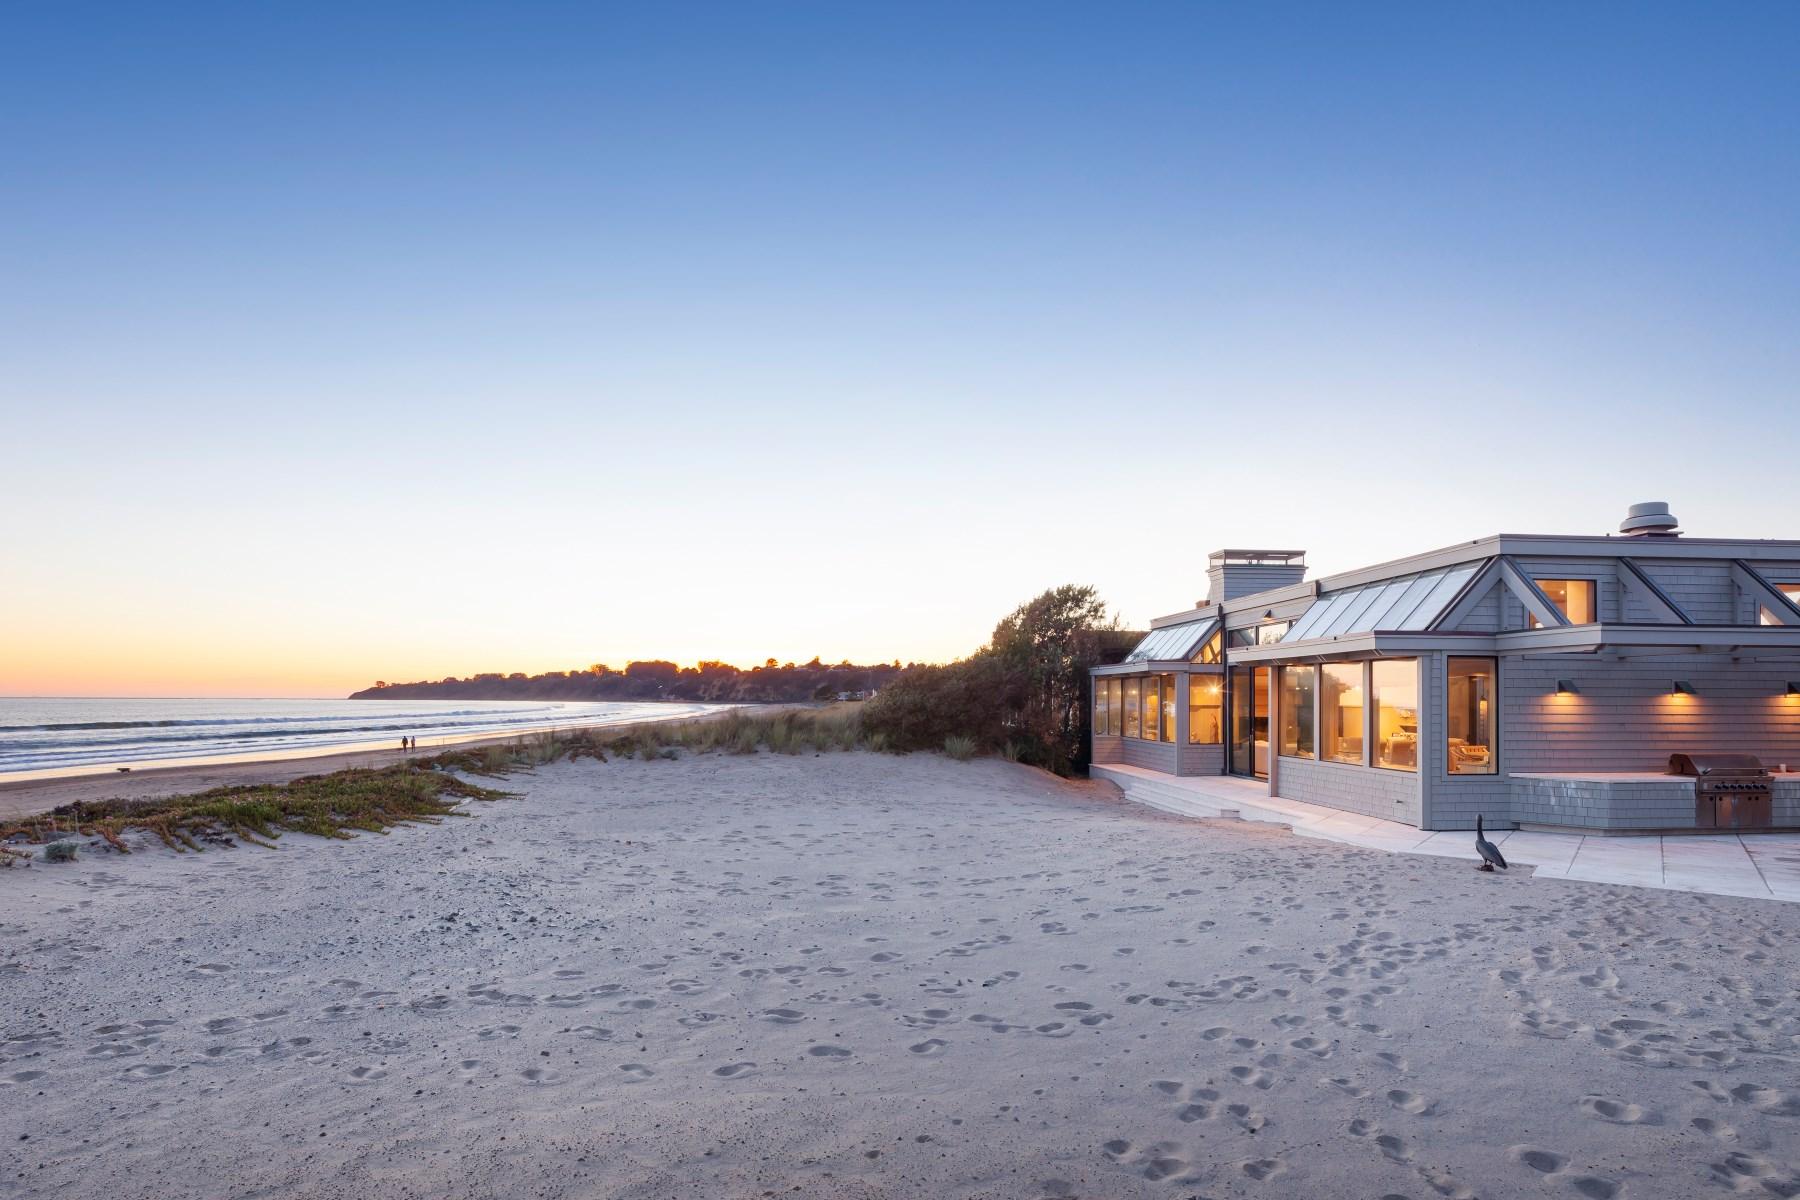 Single Family Home for Sale at Rare Opportunity in Stinson Beach Stinson Beach, California 94970 United States